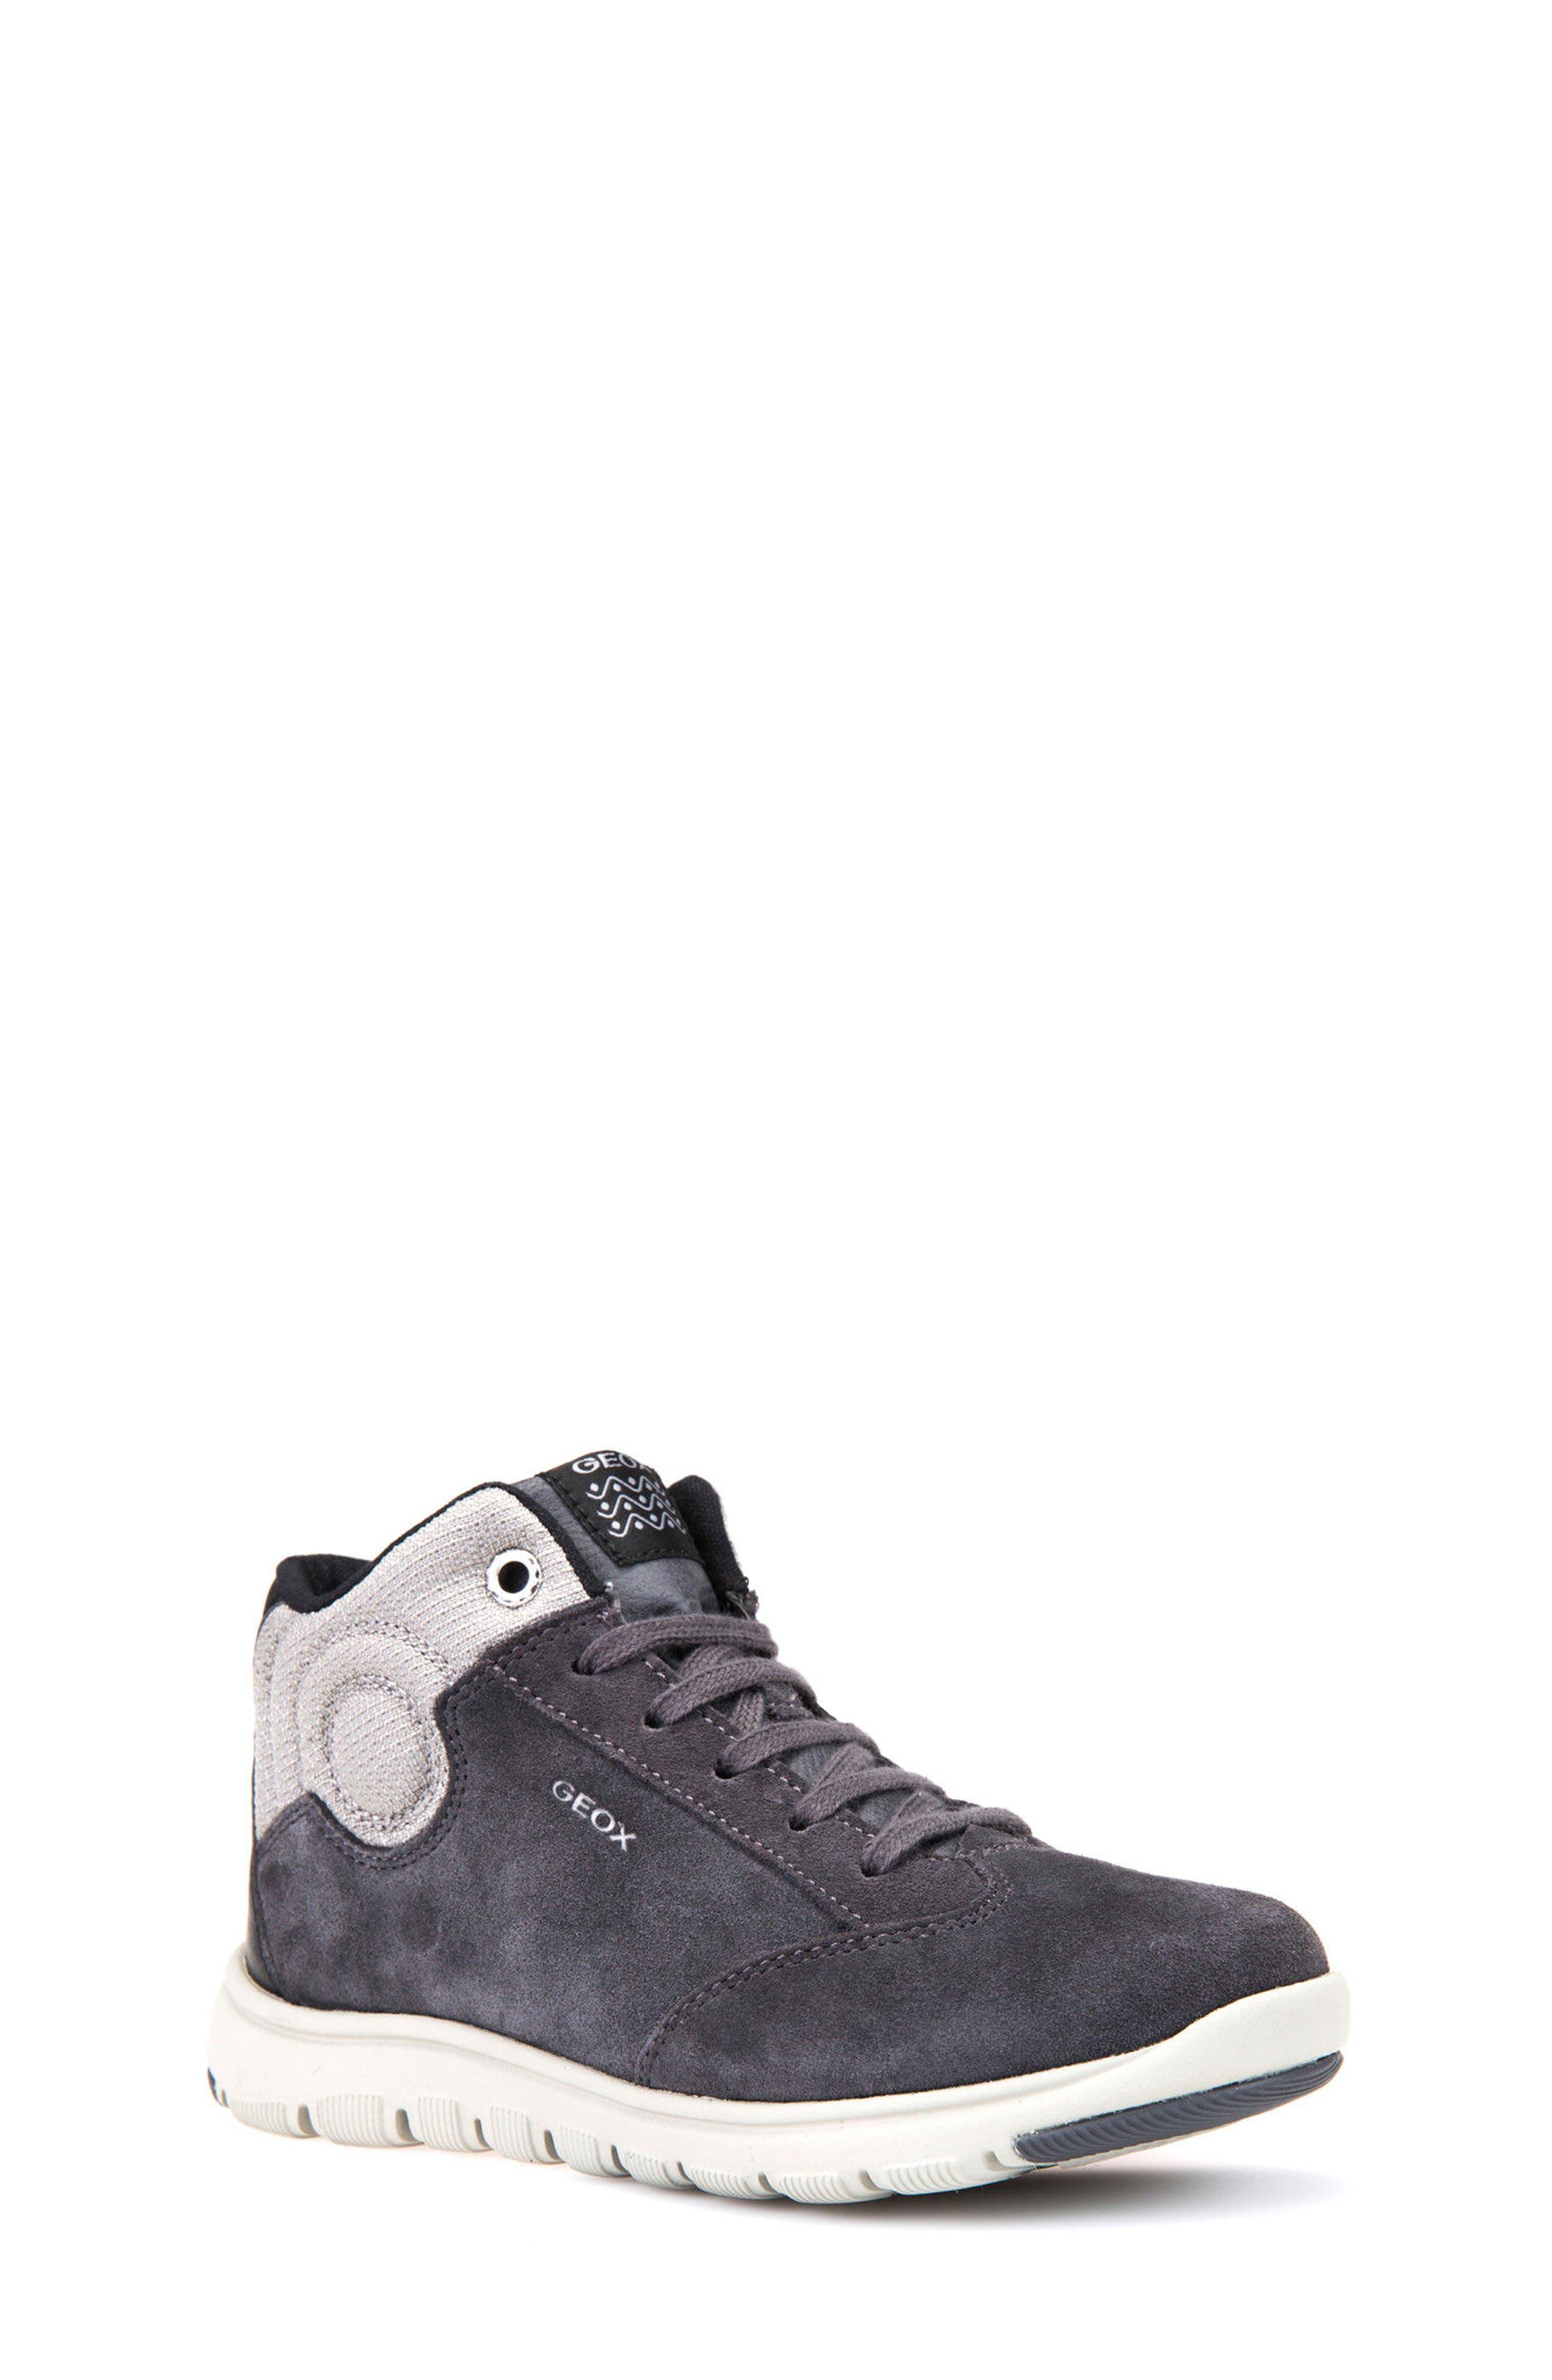 Xunday Mid Top Sneaker,                         Main,                         color, Grey/ Light Grey